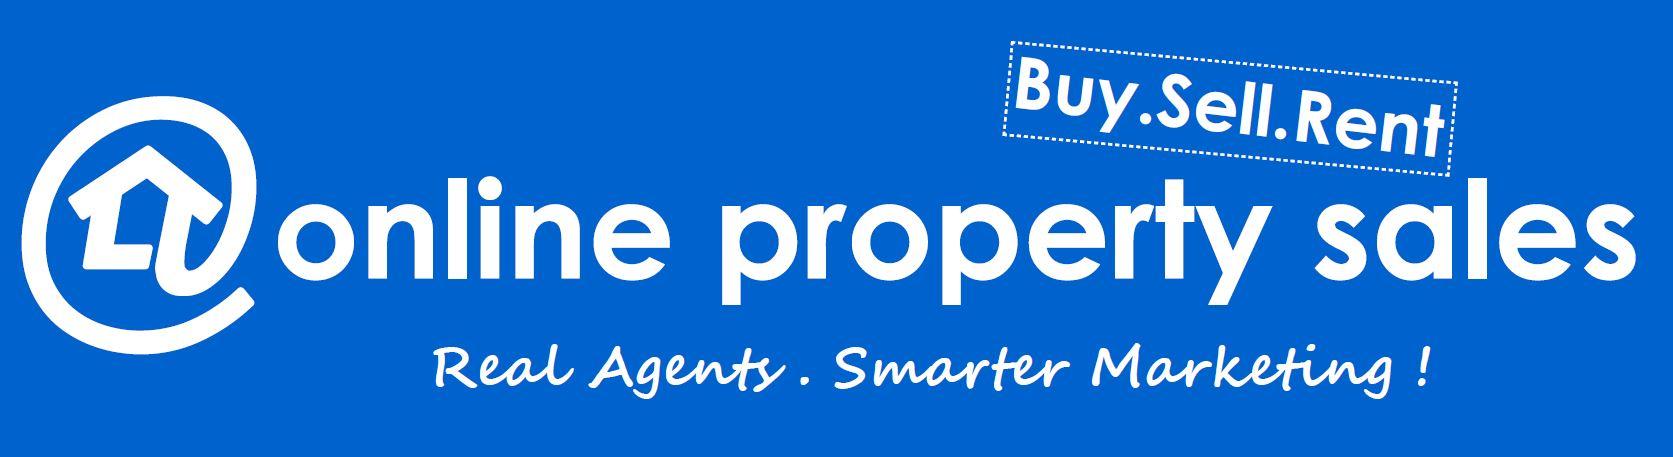 Online Property Sales - logo